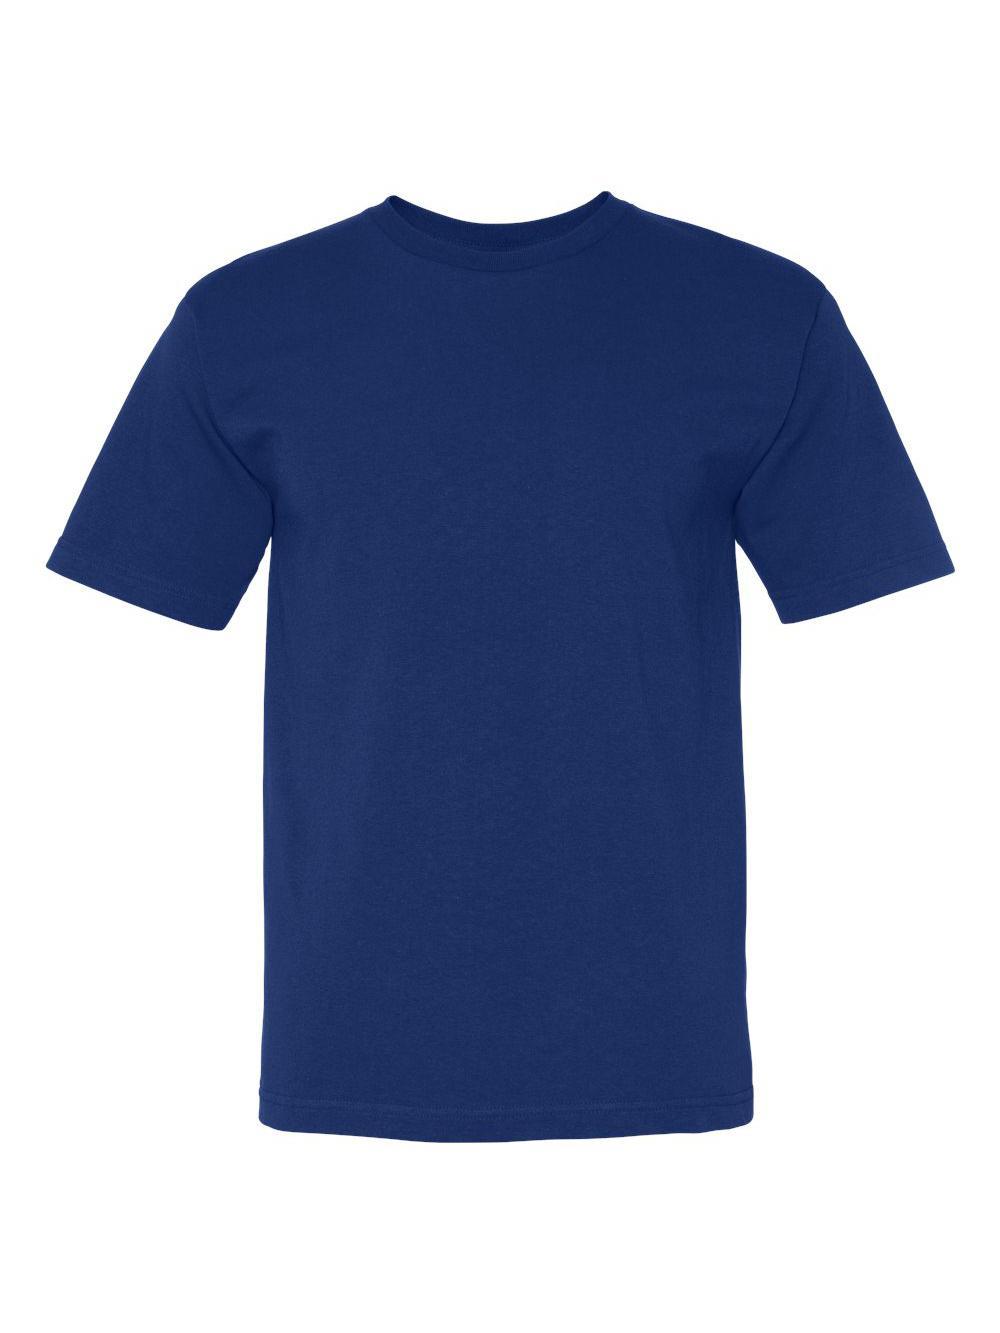 Bayside-USA-Made-100-Cotton-Short-Sleeve-T-Shirt-5040 thumbnail 30